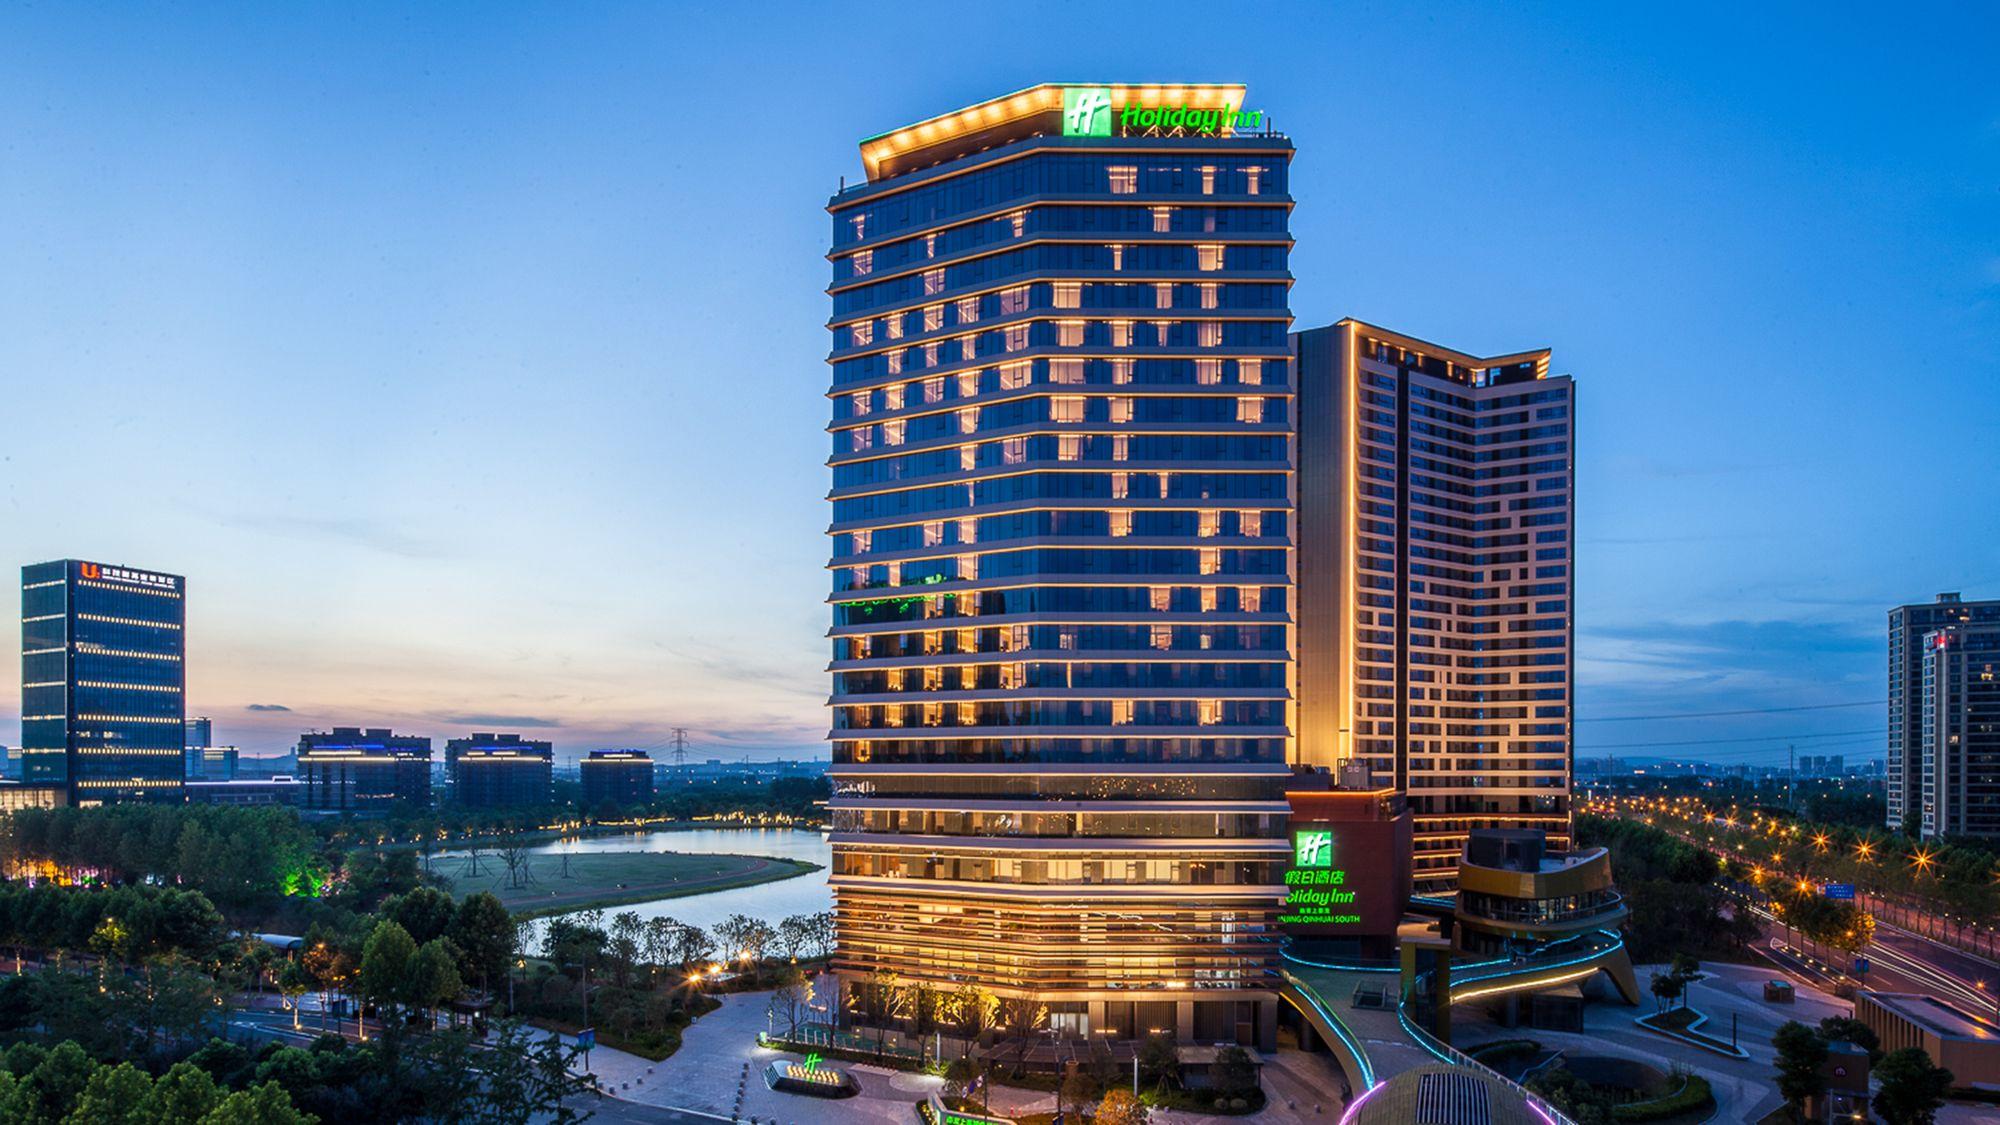 Holiday Inn Nanjing Qinhuai South